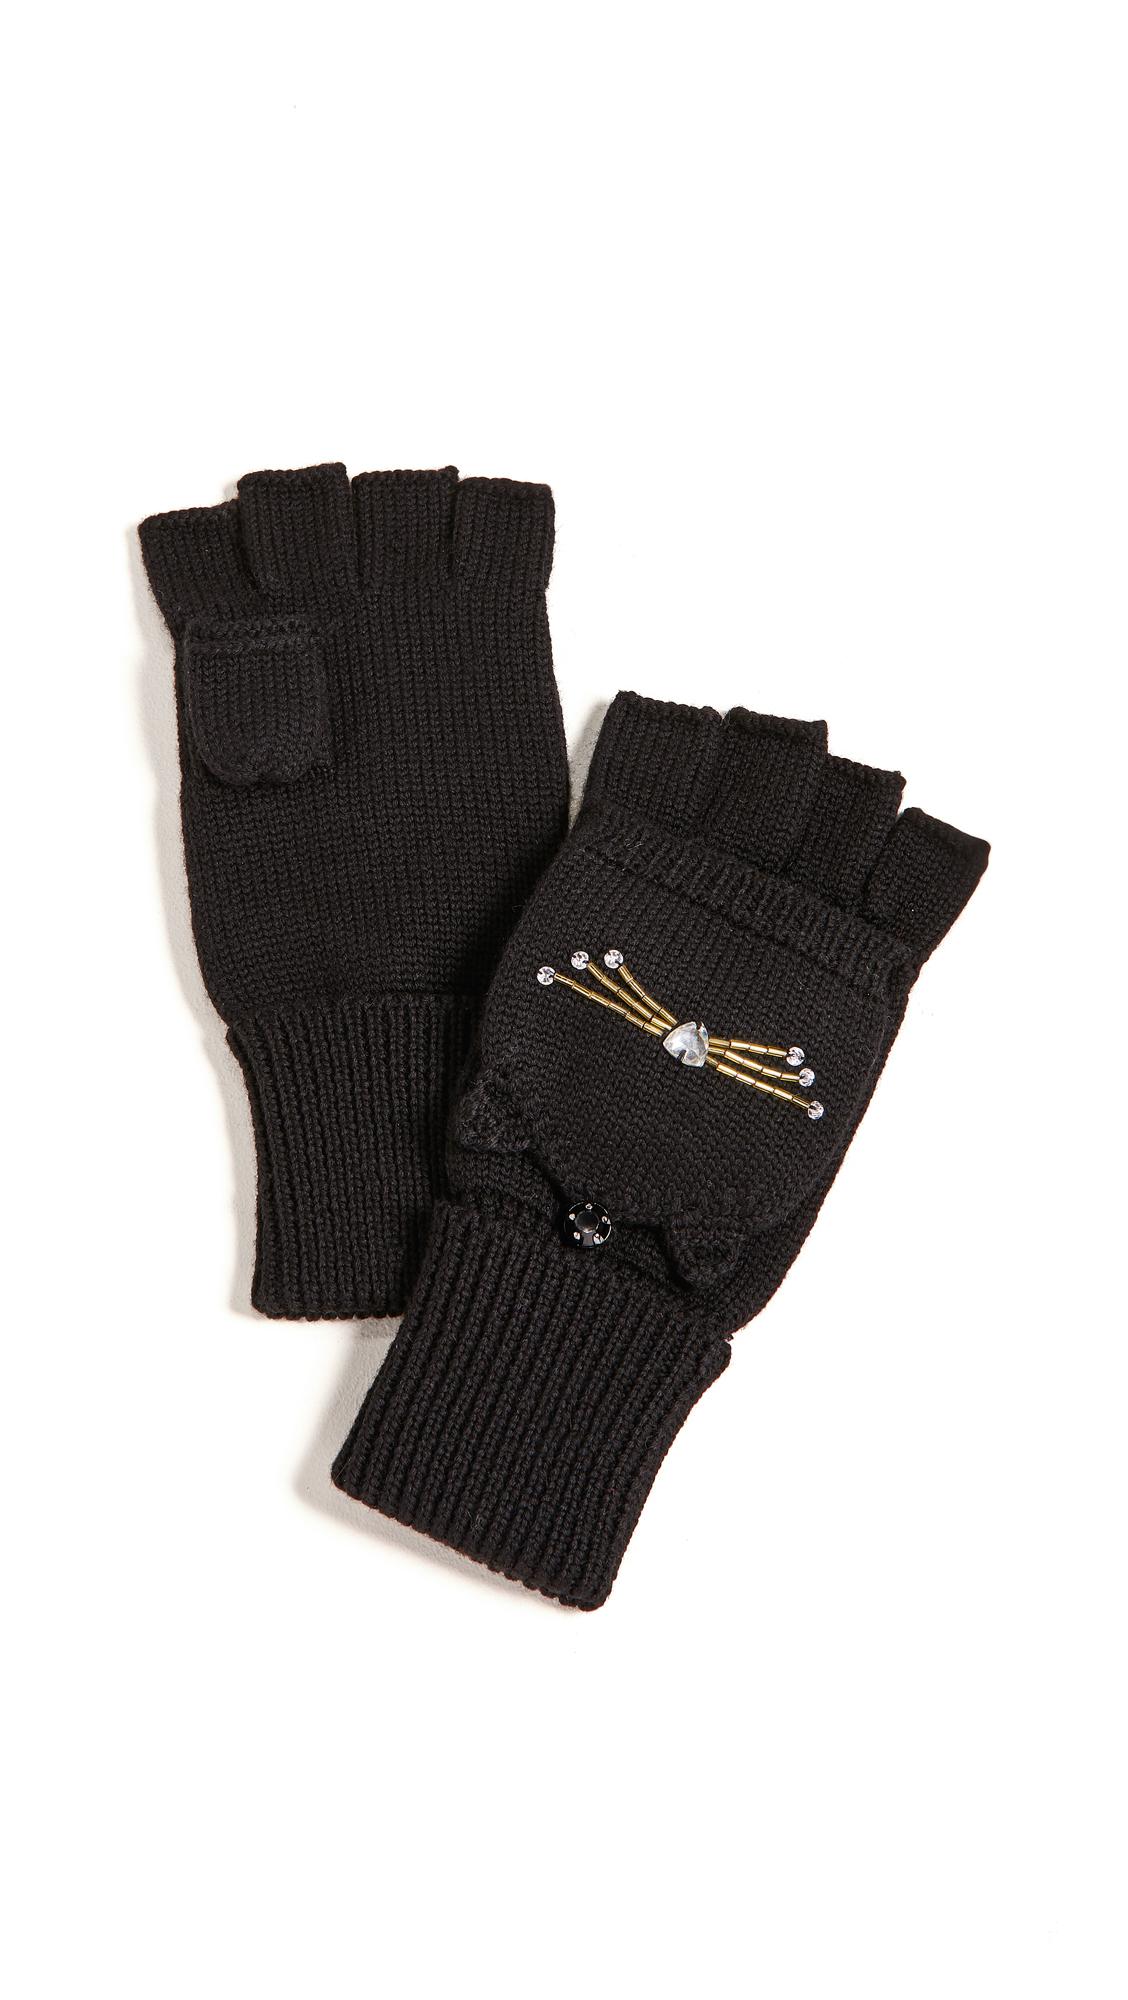 Kate Spade New York Embellished Cat Pop Top Mittens In Black